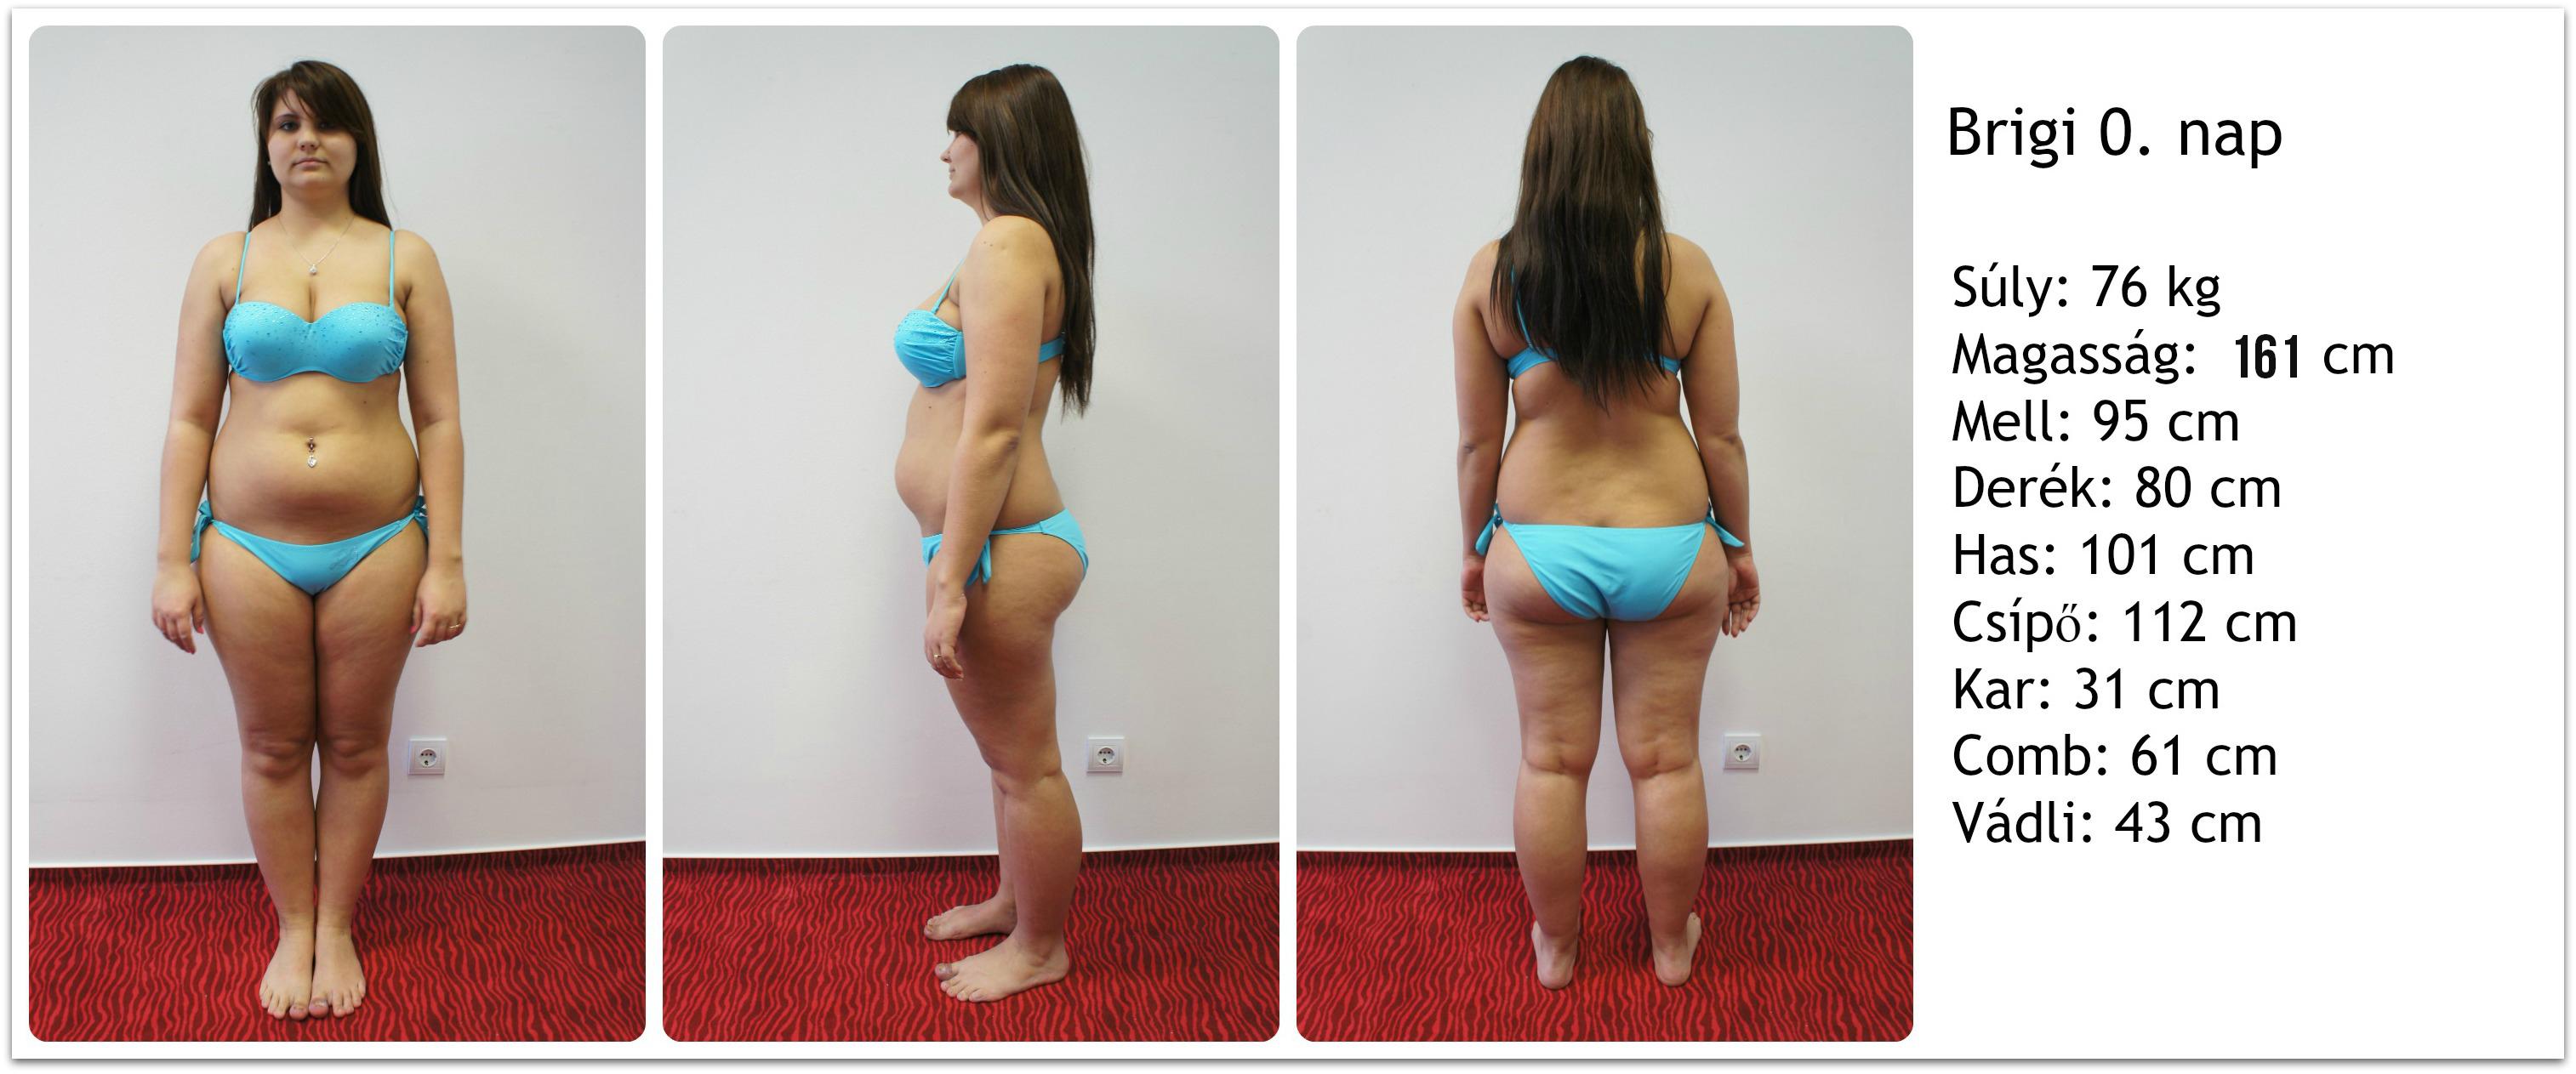 3 nap alatt 10 kg)